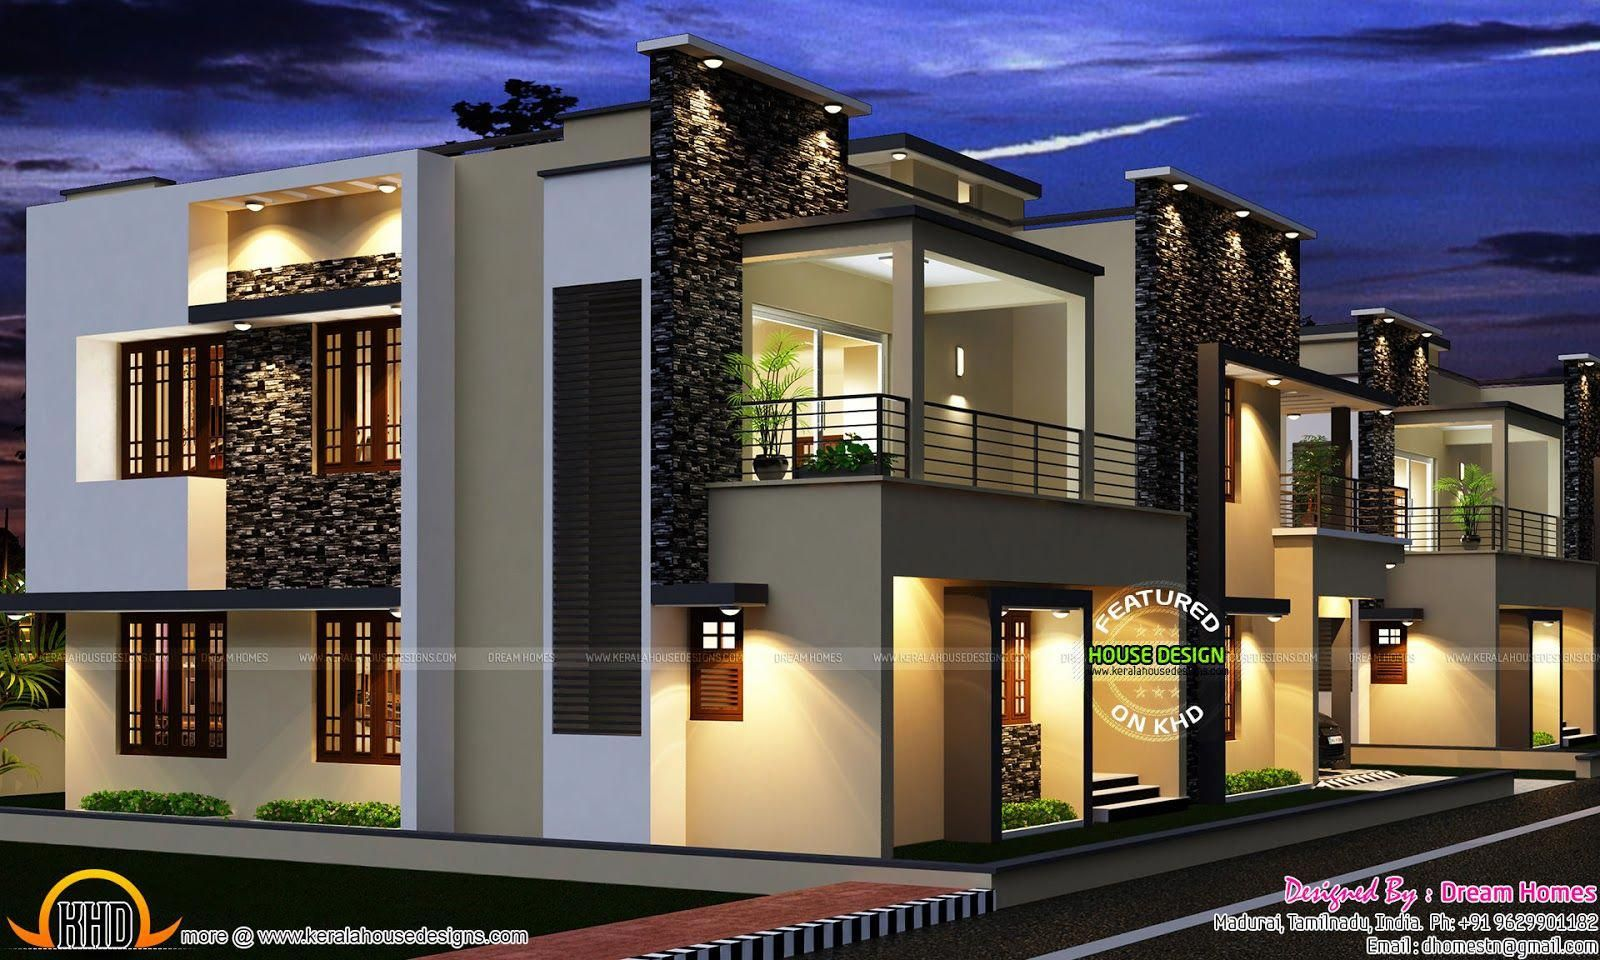 Tamilnadu villa plan kerala home design and floor plans minimalisthouseplans also rh pinterest